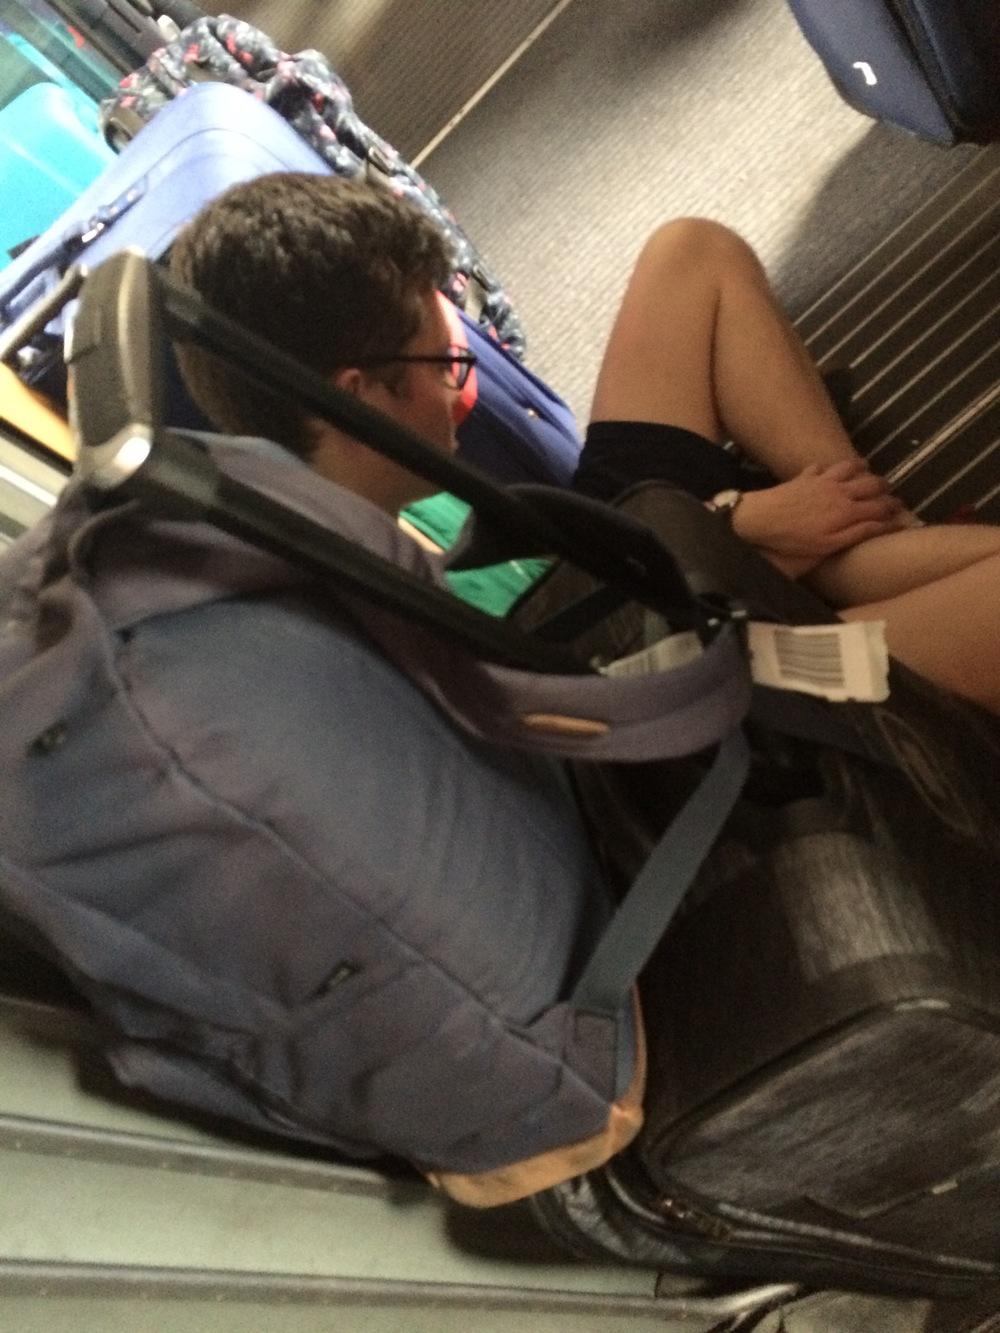 Noel prepares for his slumber on the train from Stuttgart to Tübingen — only to be woken up by elderly German women!